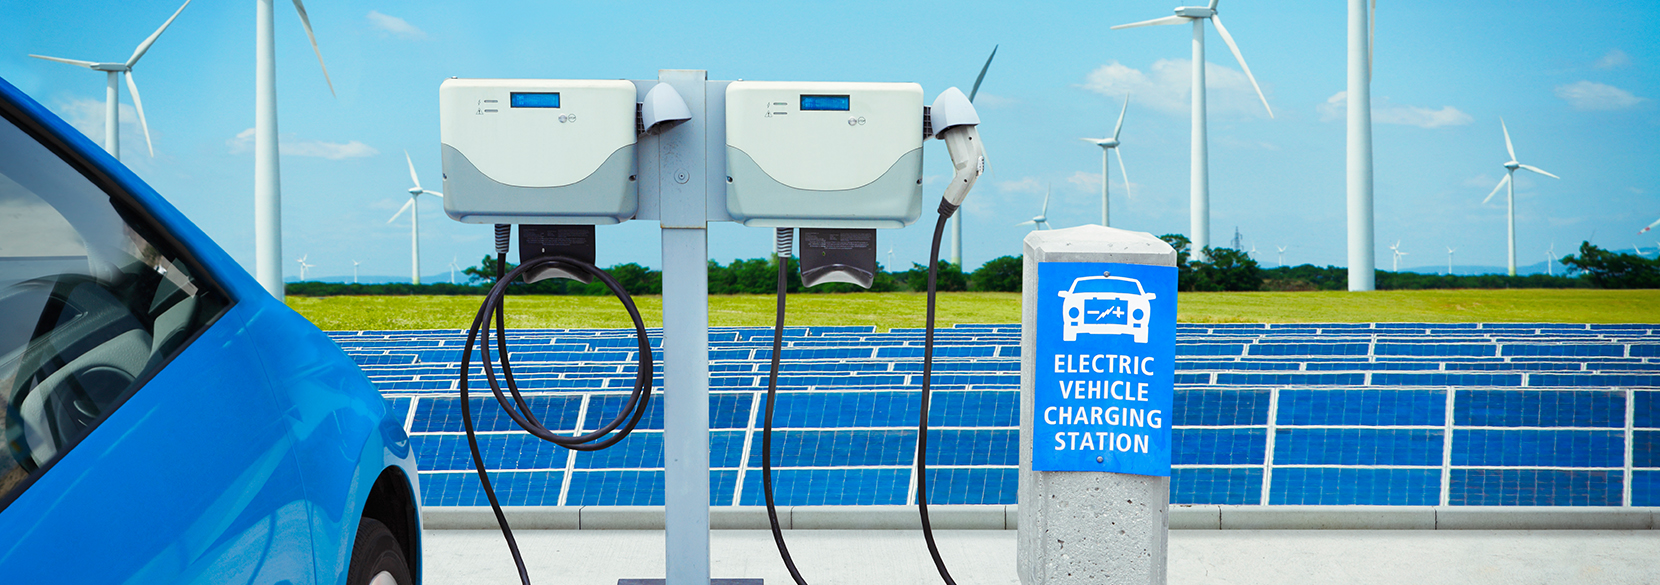 Energiezukunft – Electrosuisse